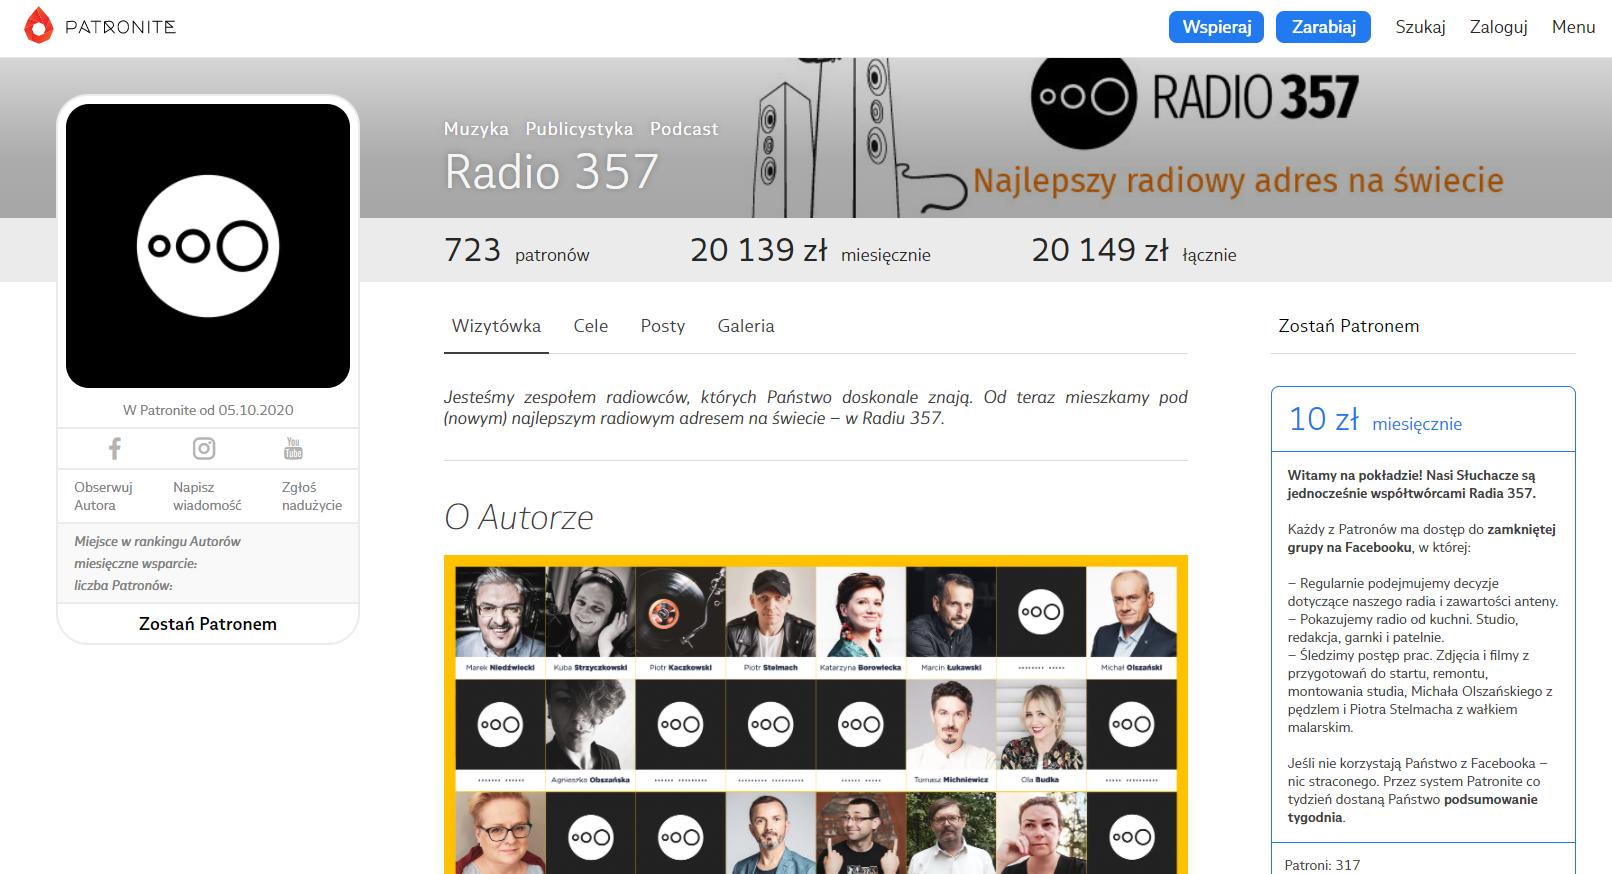 Radio 357 - nowa internetowa stacja radiowa